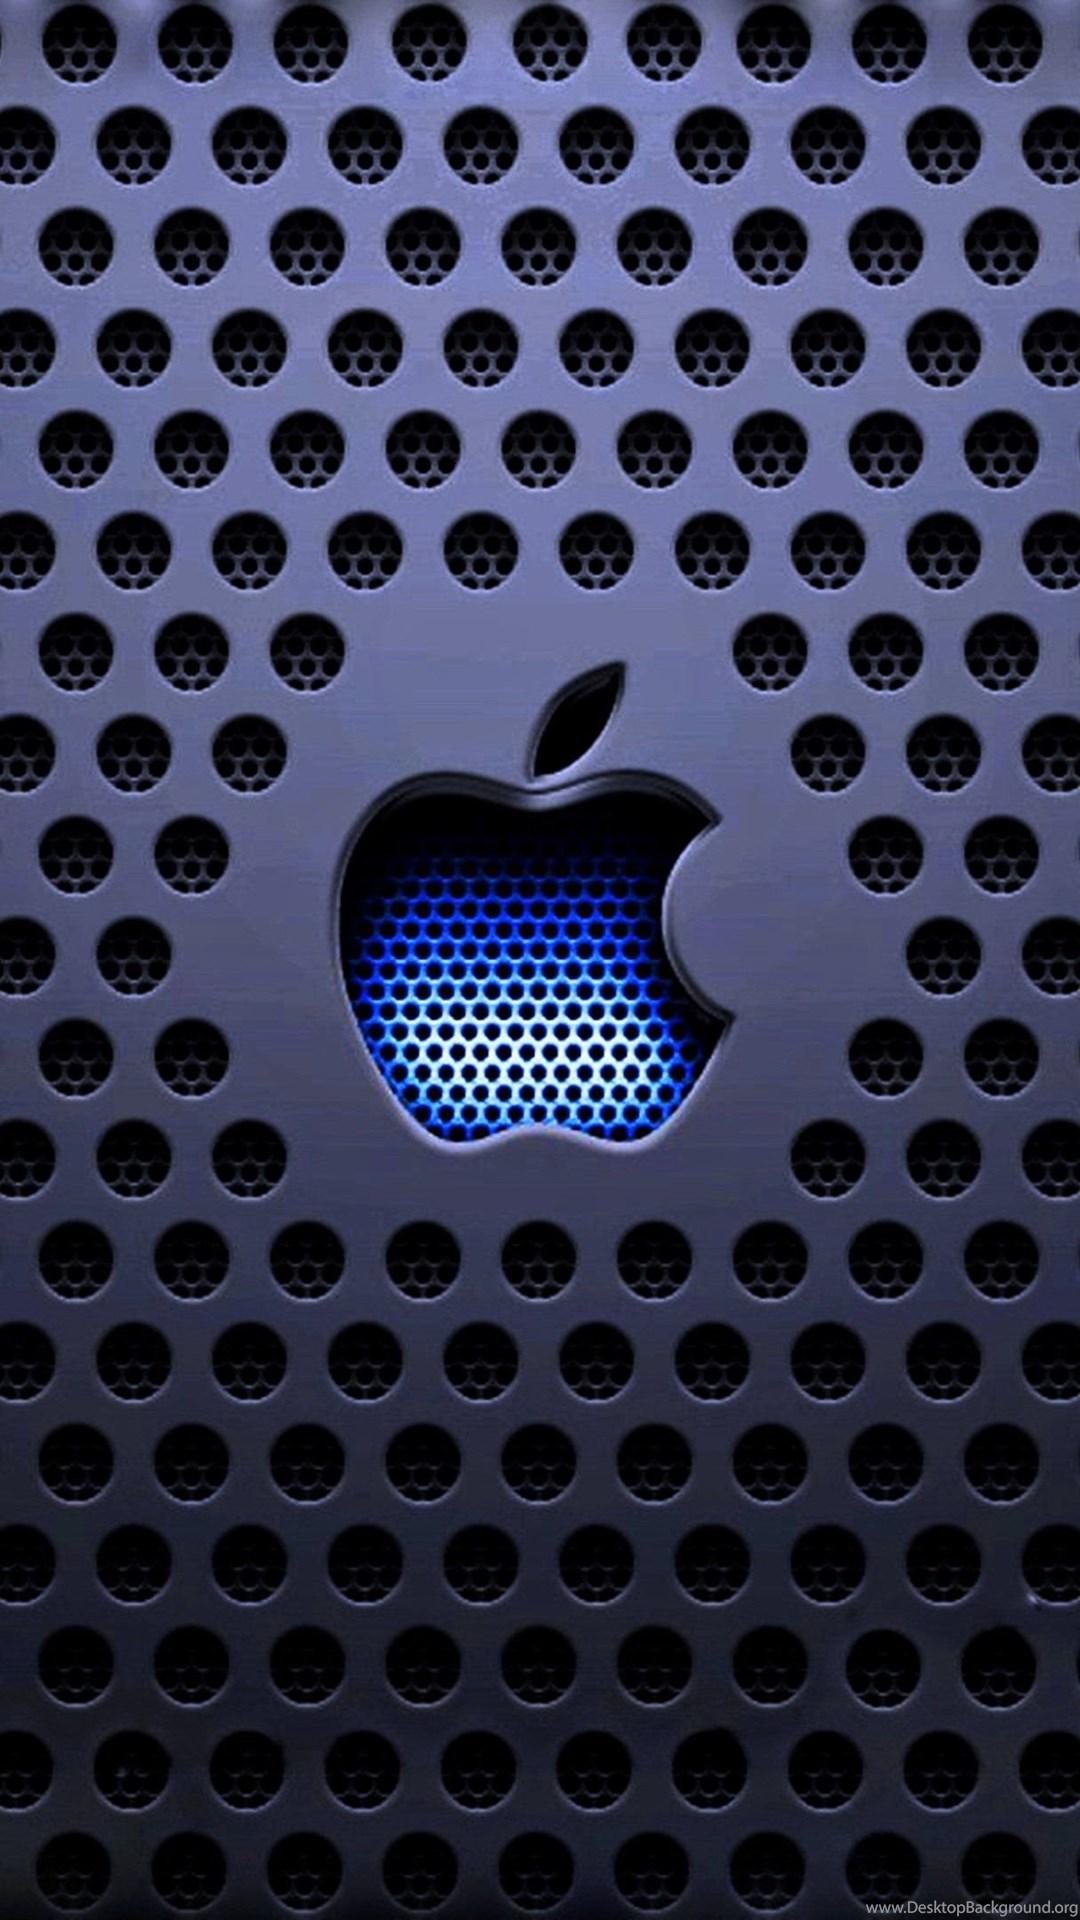 Technology Apple Wallpaper Backgrounds Mac Wallpapers Desktop Background